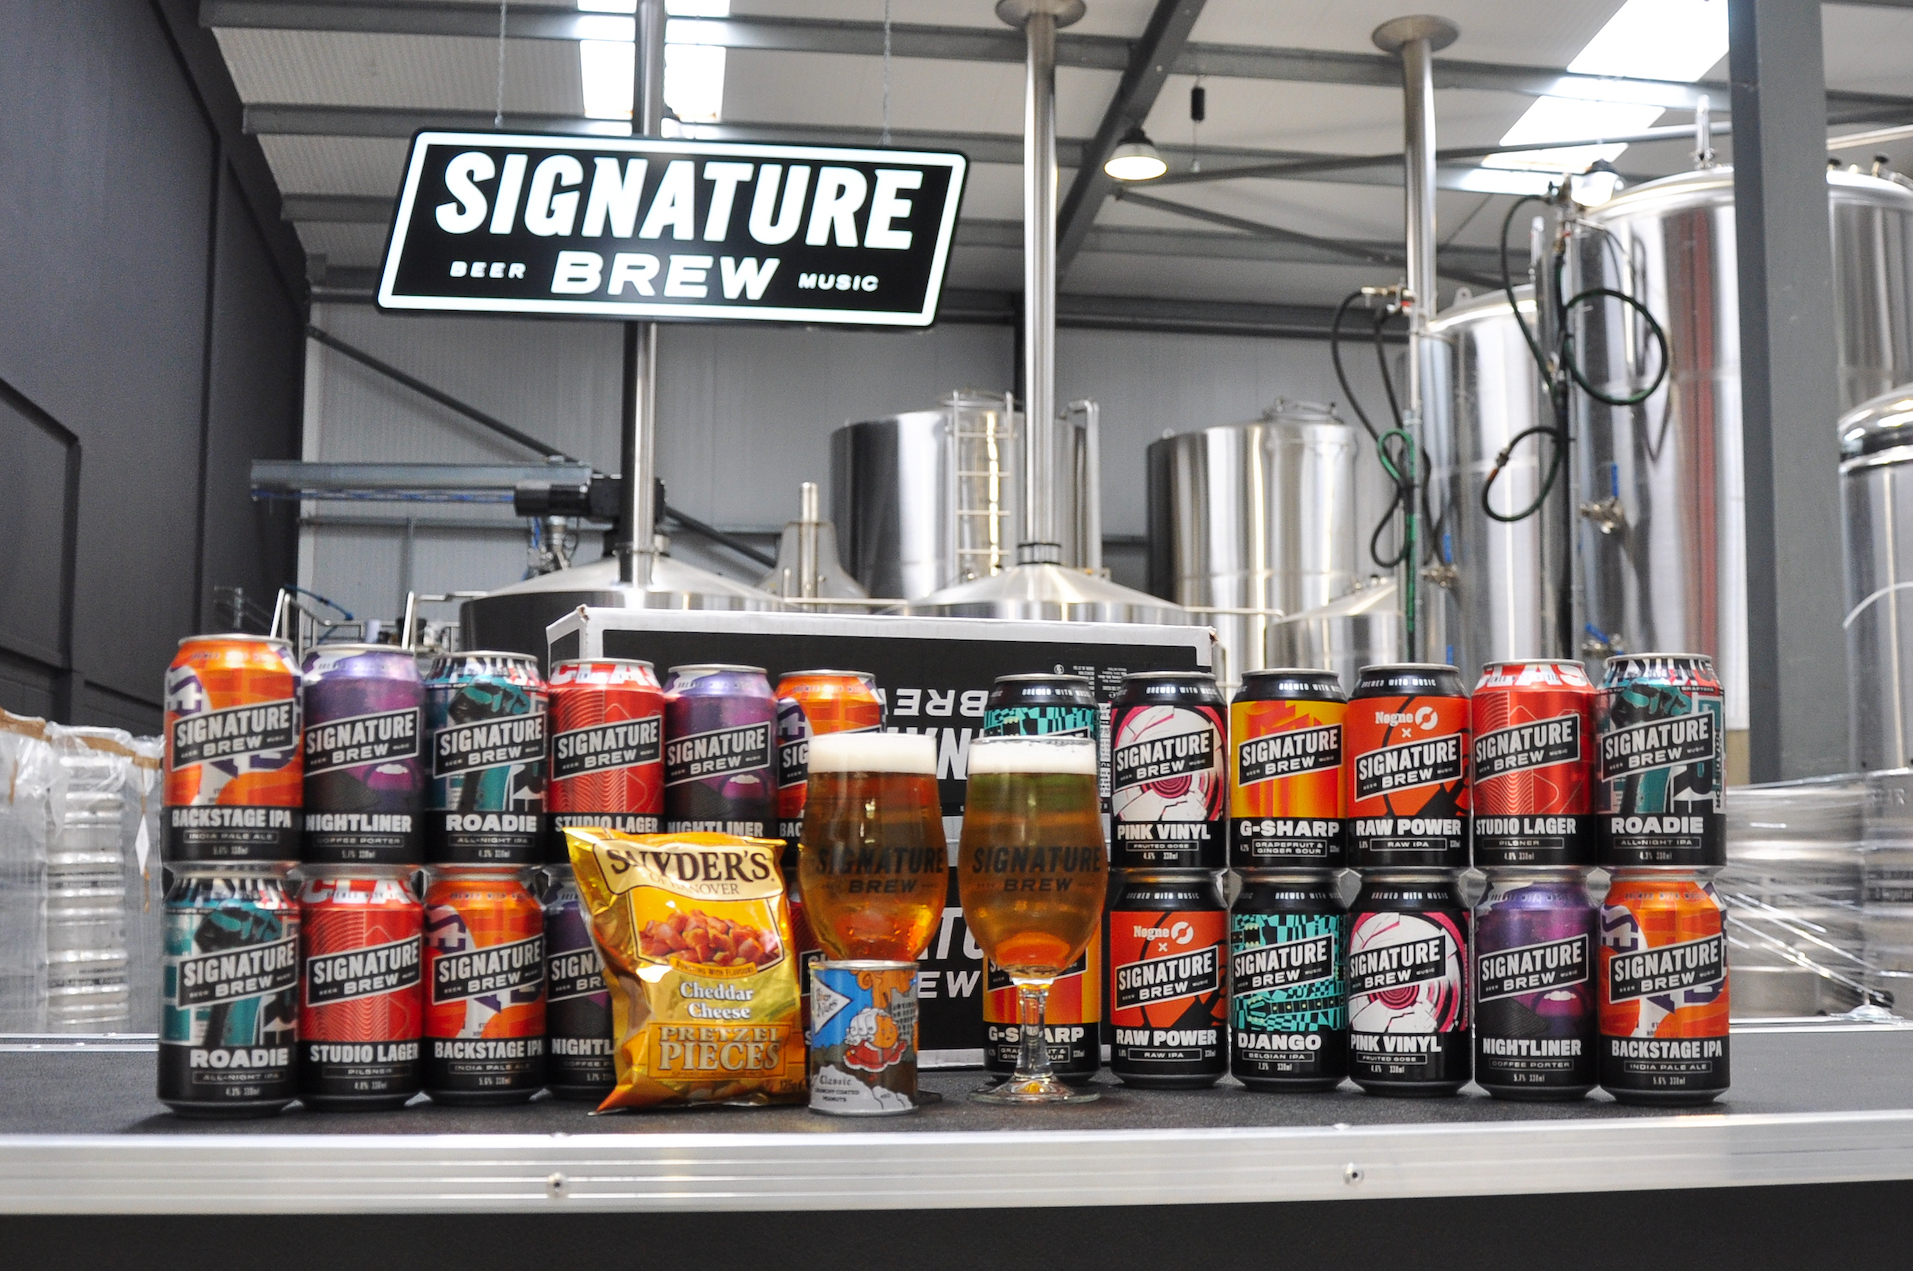 Signature Brew Launch Core Range of Music-Inspired Beers Worldwide